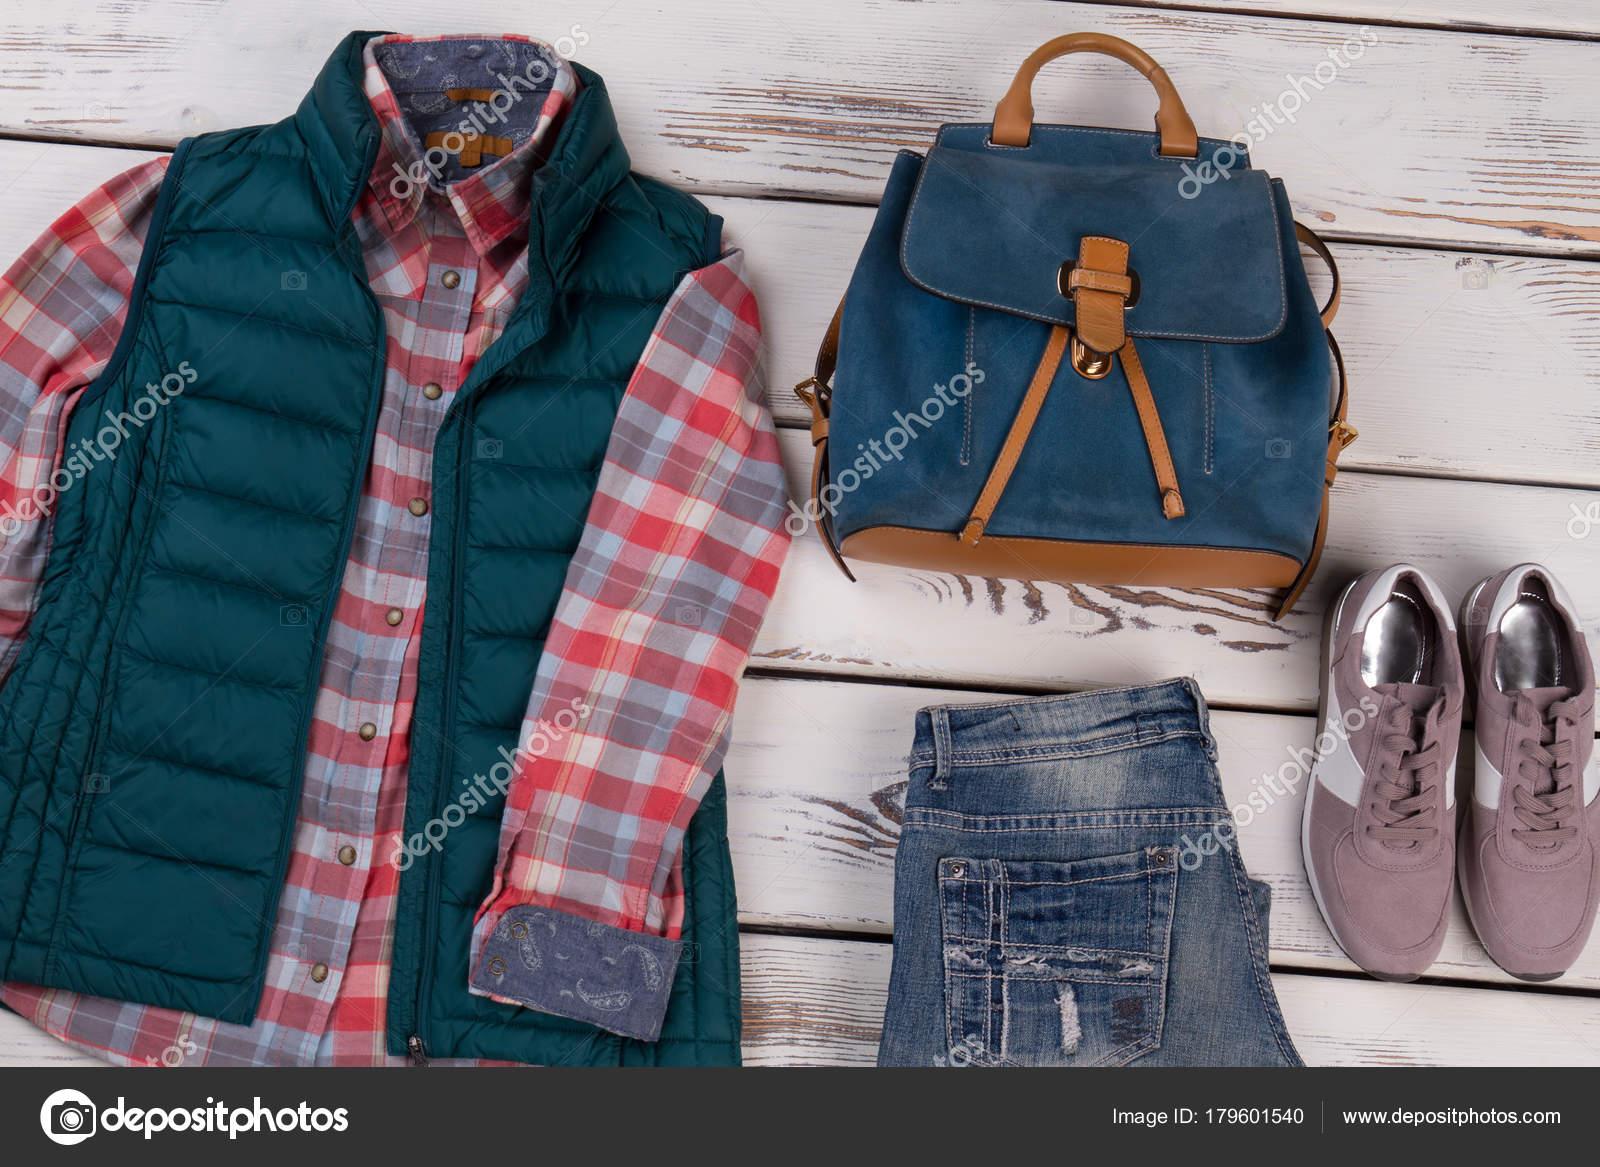 697e0d230a0b Νωρίς Φθινοπωρινά Ρούχα και αξεσουάρ — Φωτογραφία Αρχείου ...